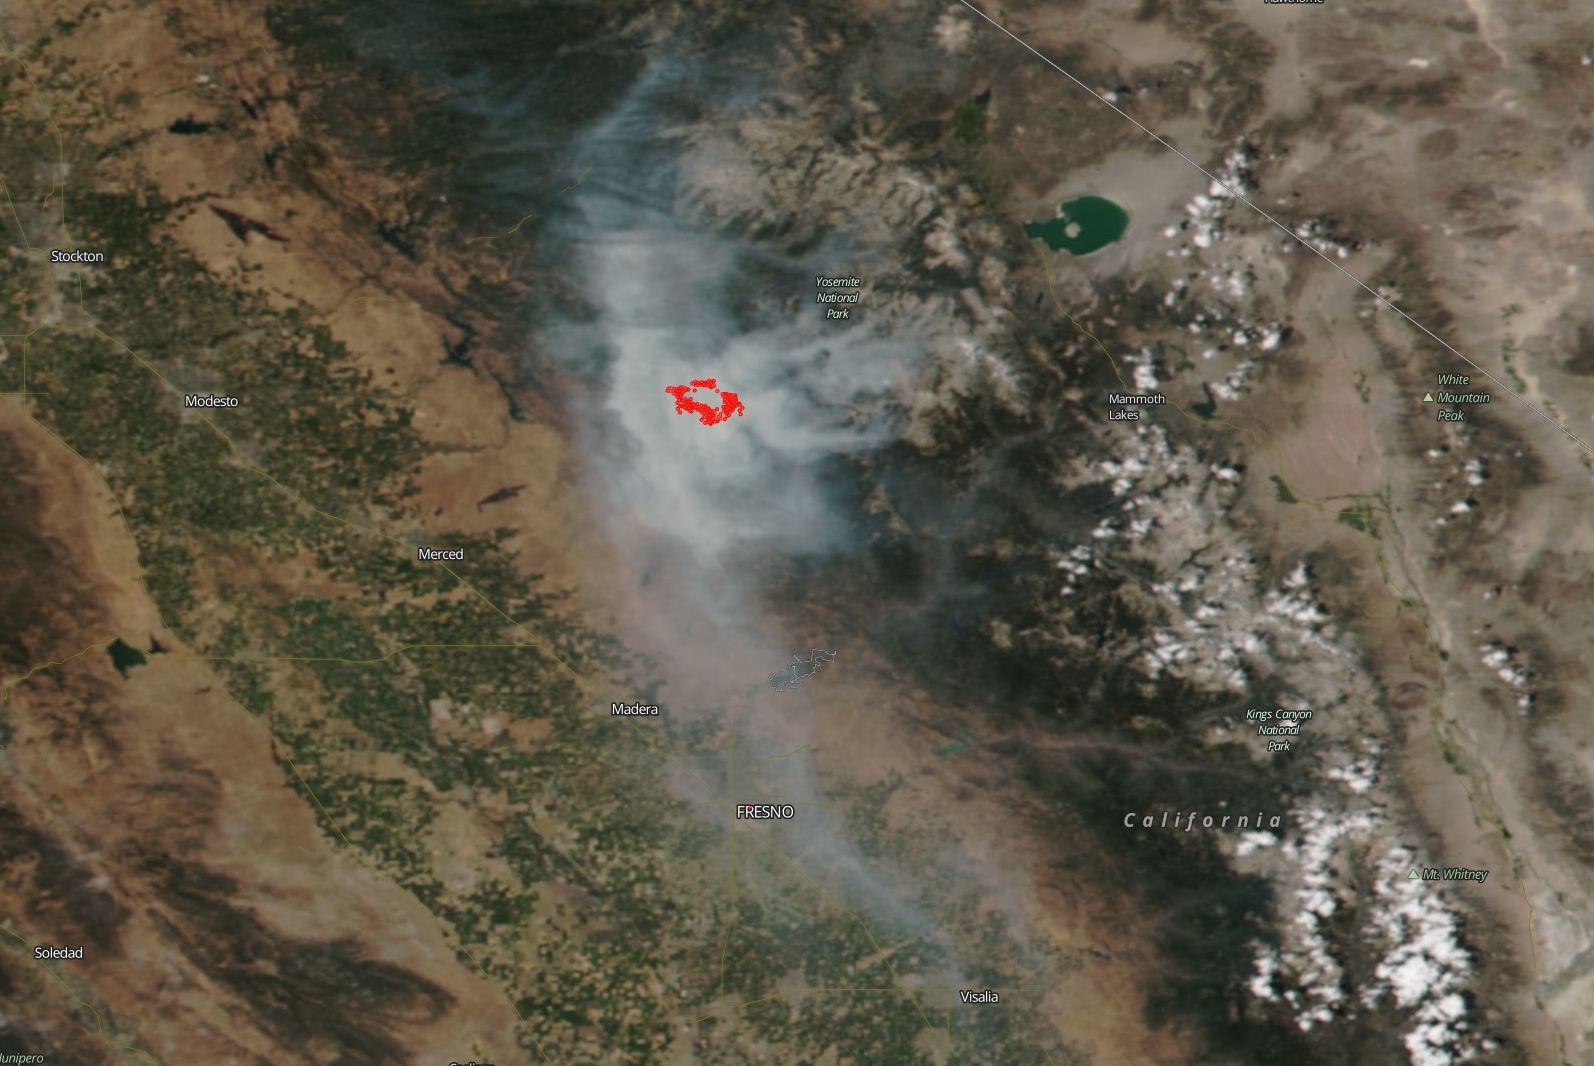 Yosemite Forum • View topic - Ferguson Fire - smoke reports etc